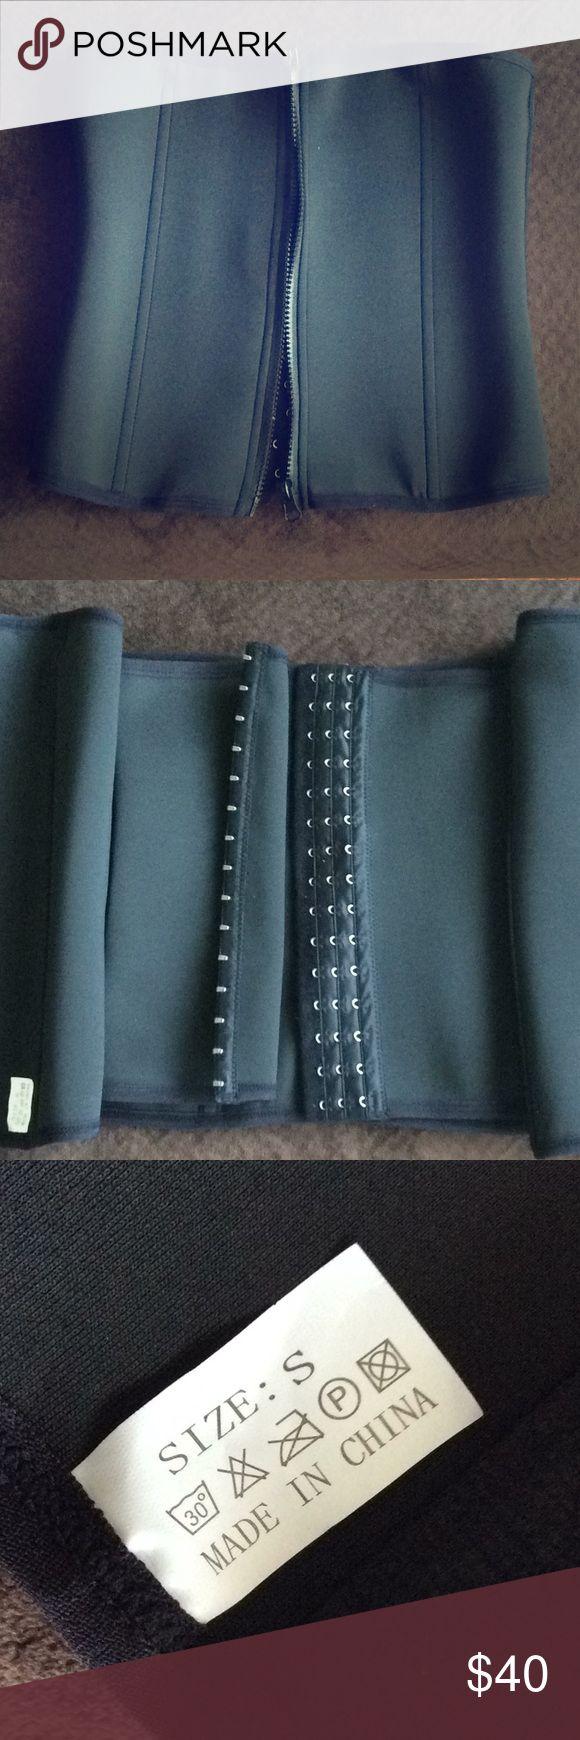 Workout corset (brand new) Small black (25-27 waist) workout corset Other